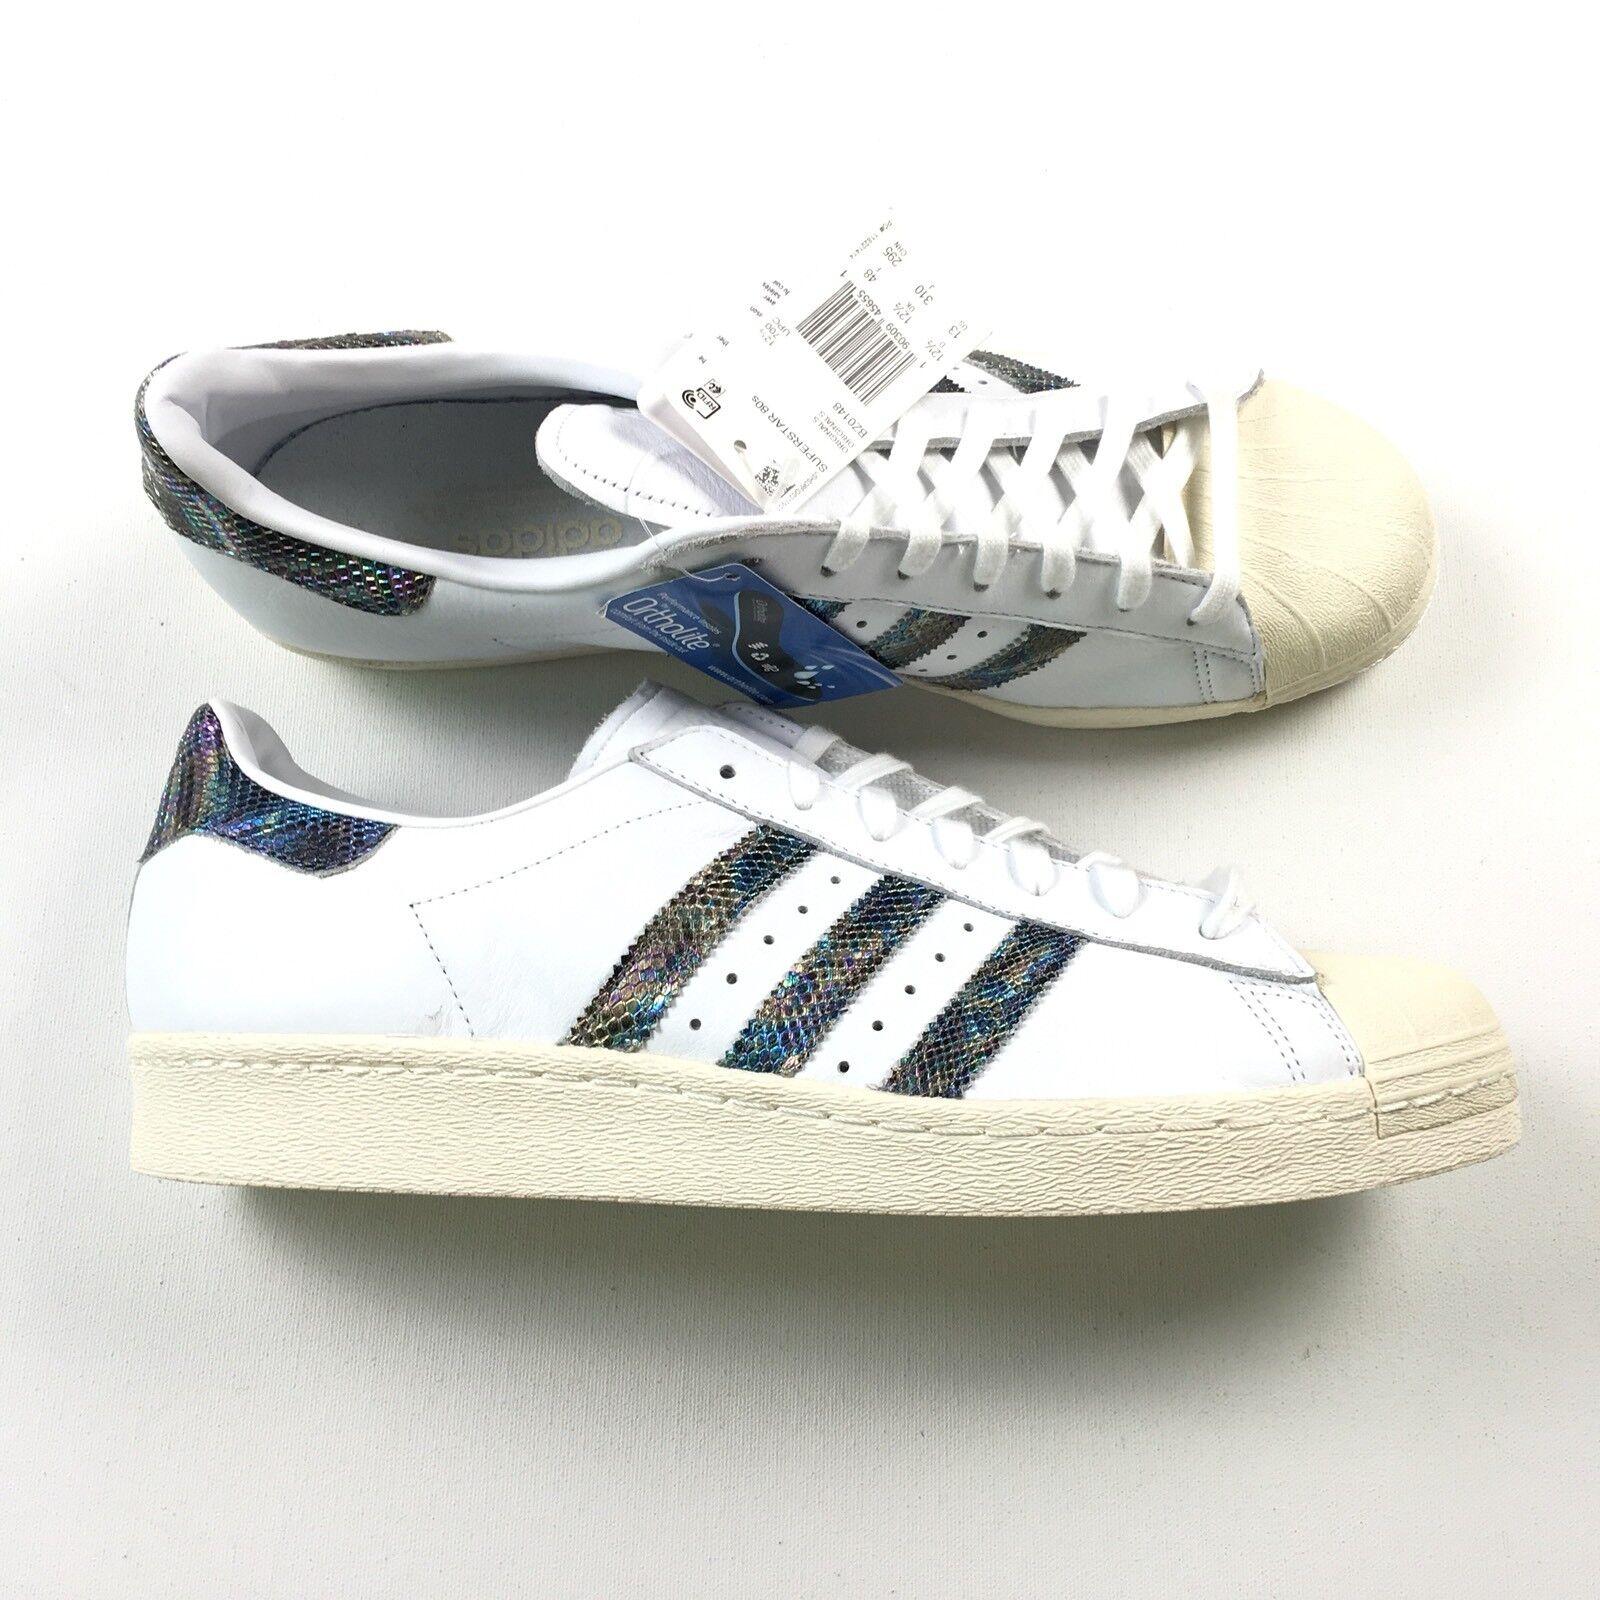 Adidas superstar 80 uomini le scarpe arte di arte scarpe bz0148 13 46e57d